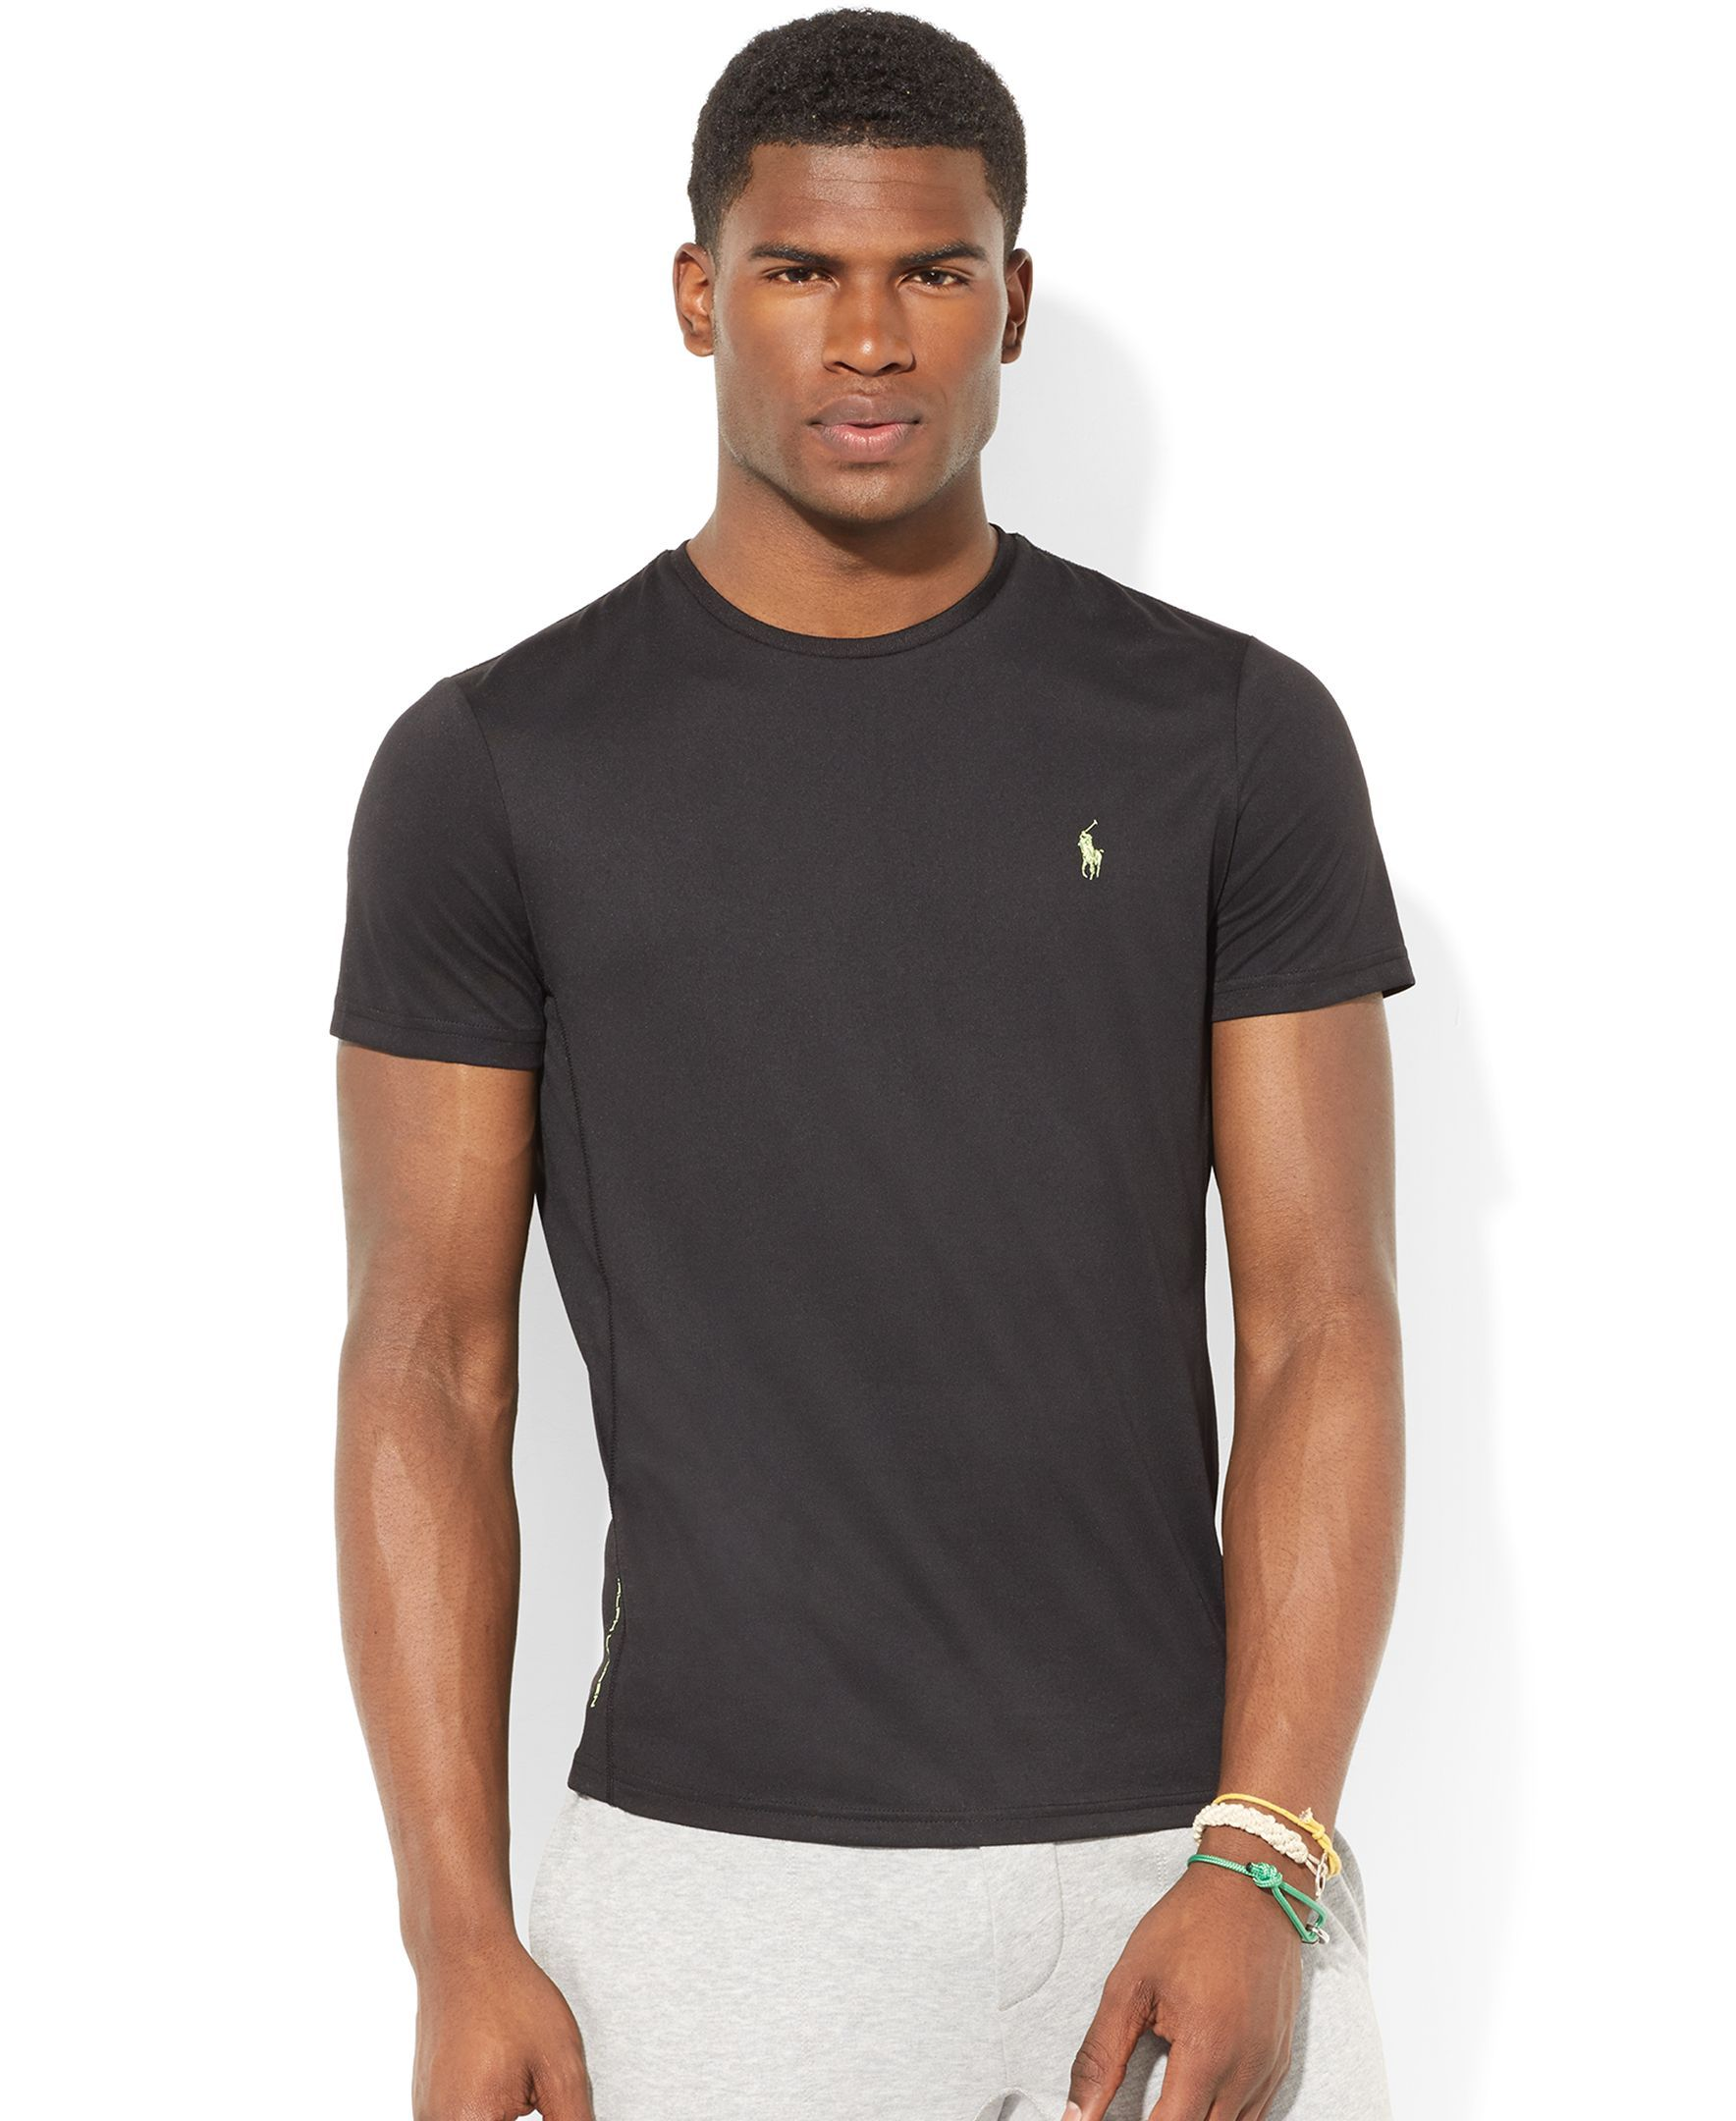 93314d2a3 Polo Ralph Lauren Jersey Performance T-Shirt | Products | Polo ralph ...